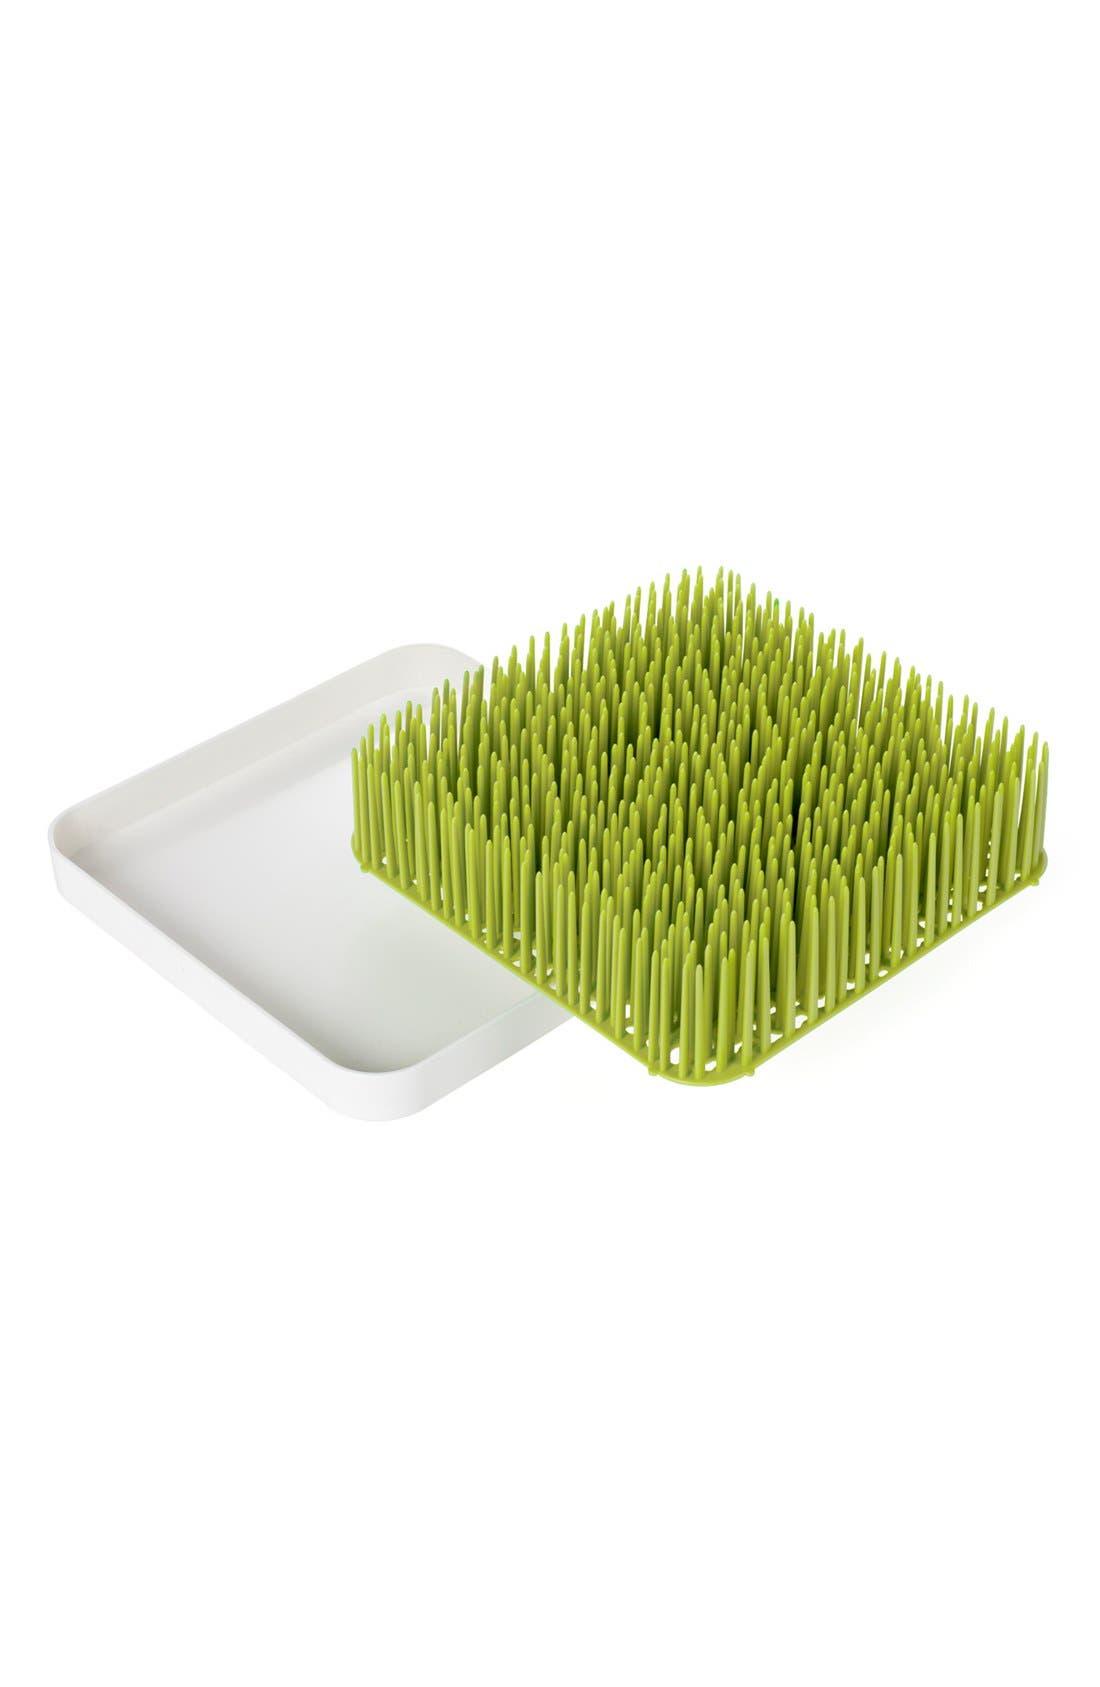 Boon 'Grass' Drying Rack